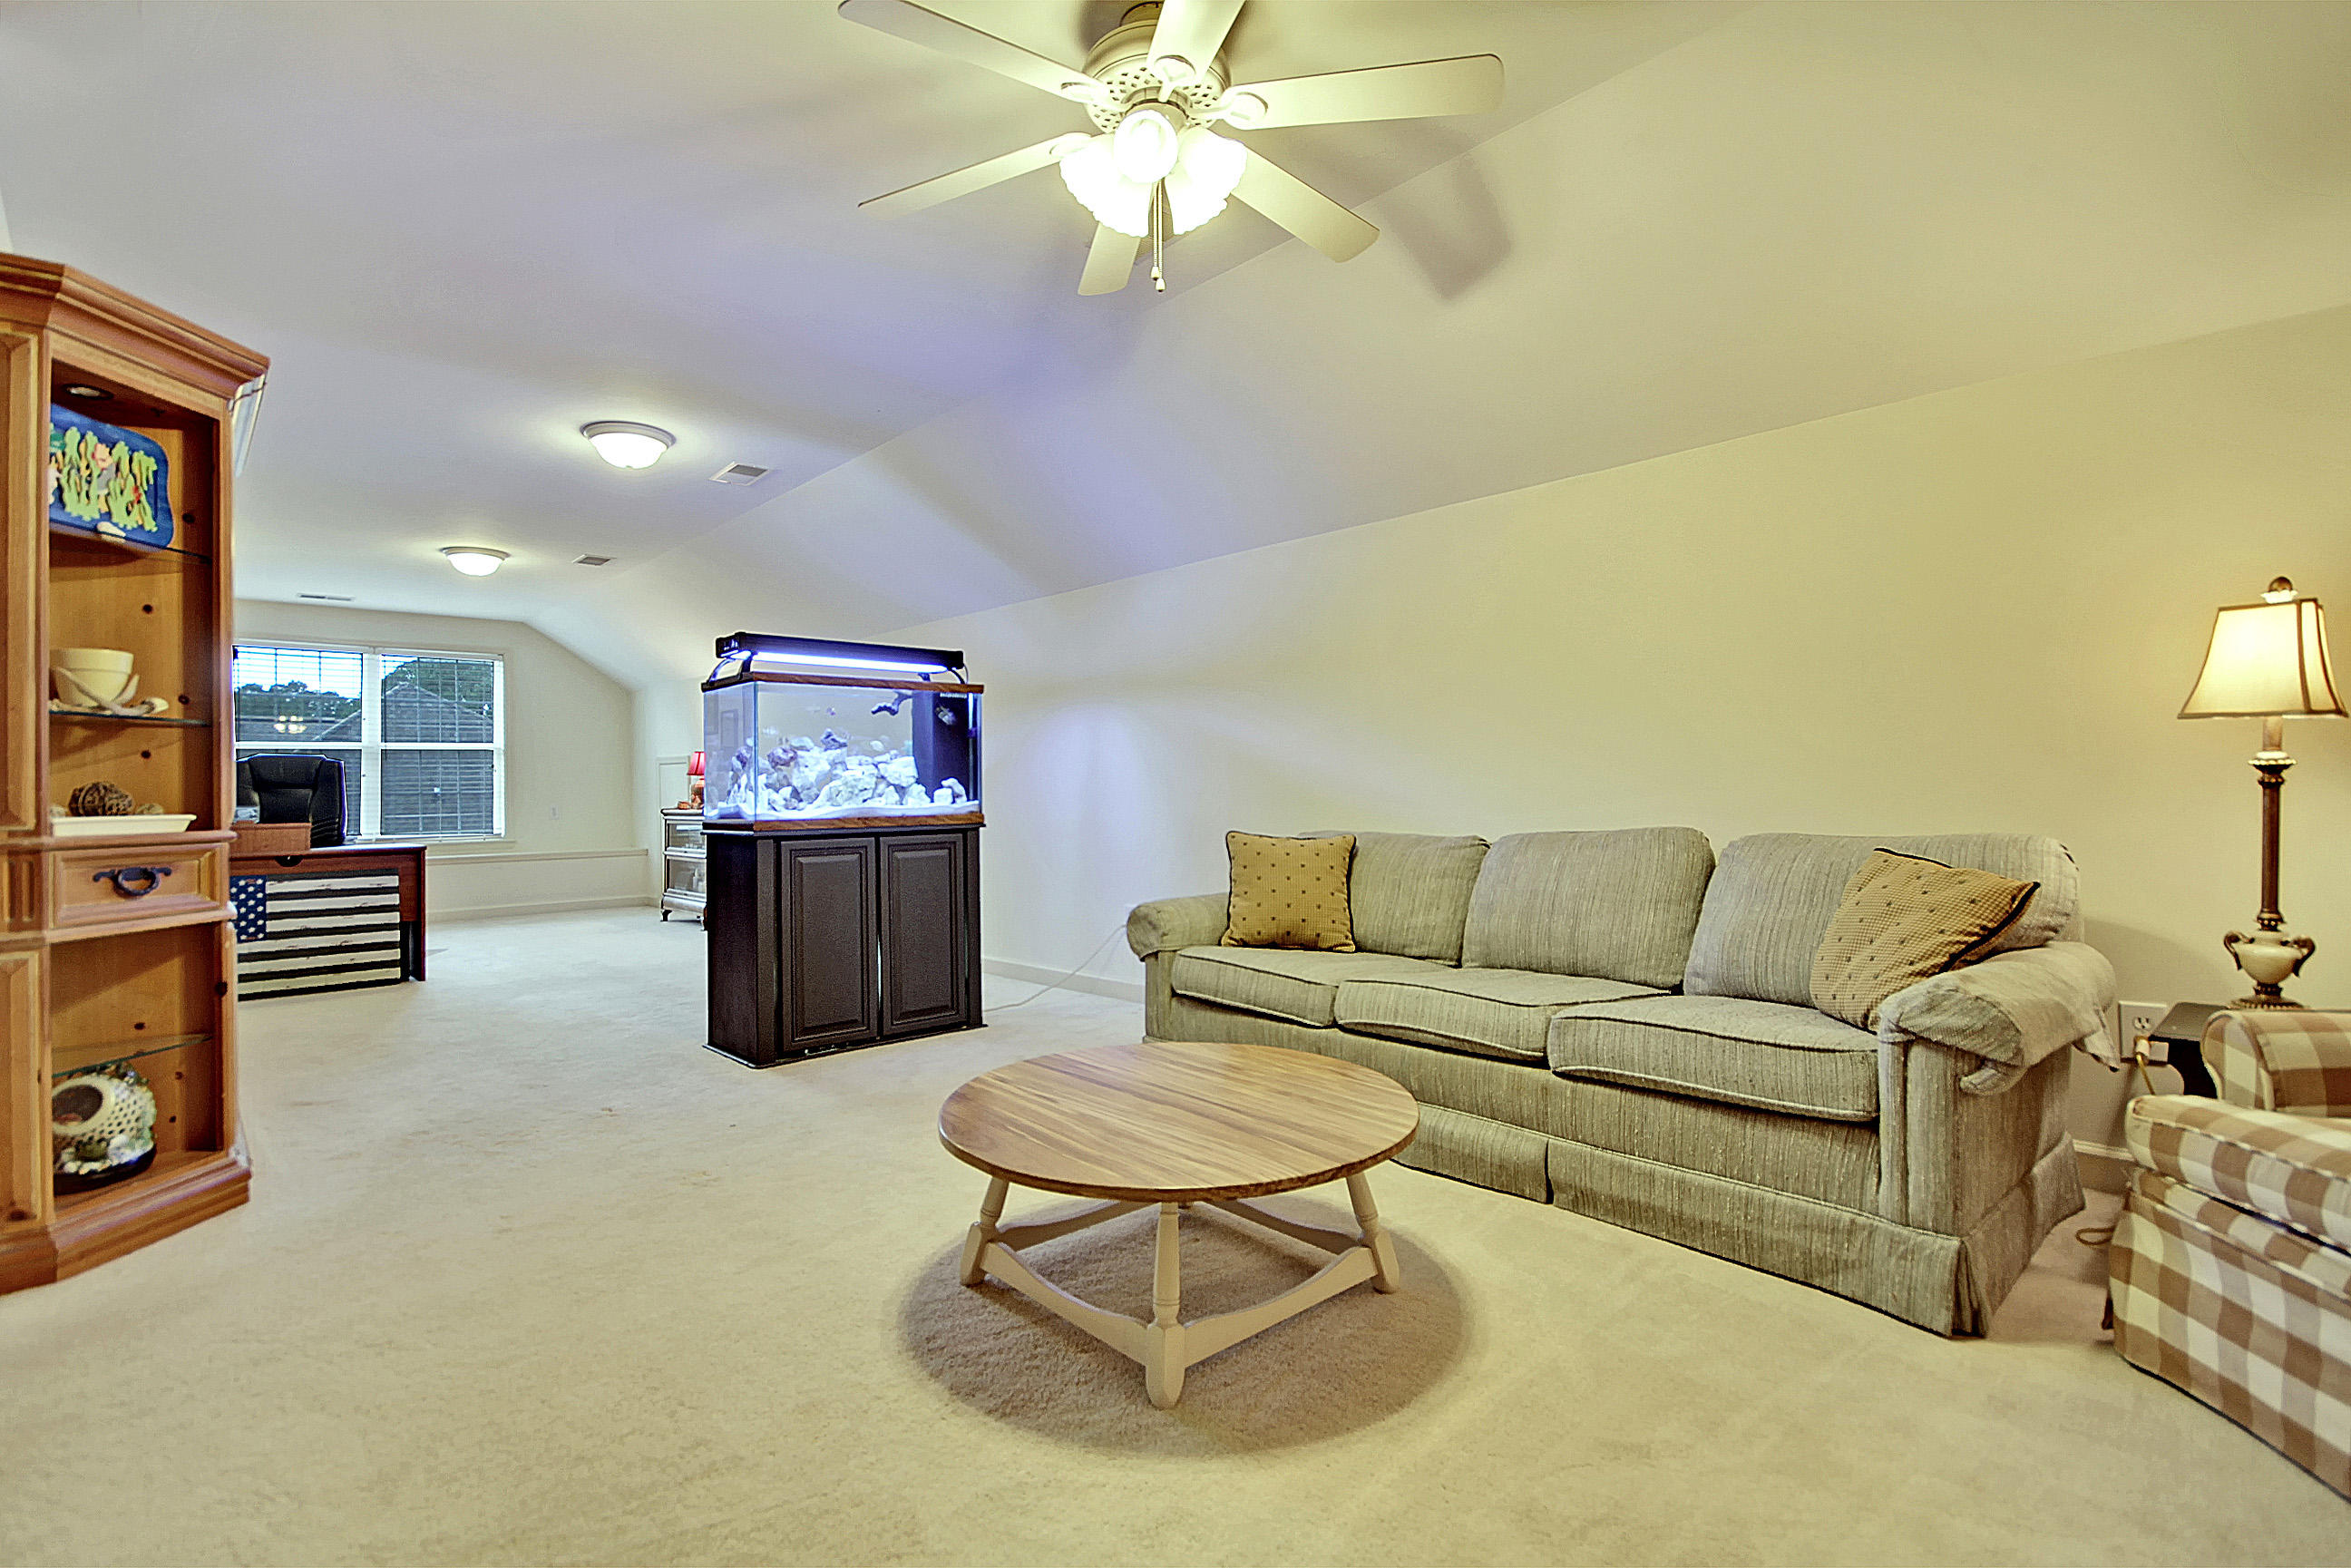 Dunes West Homes For Sale - 2449 Darts Cove, Mount Pleasant, SC - 47